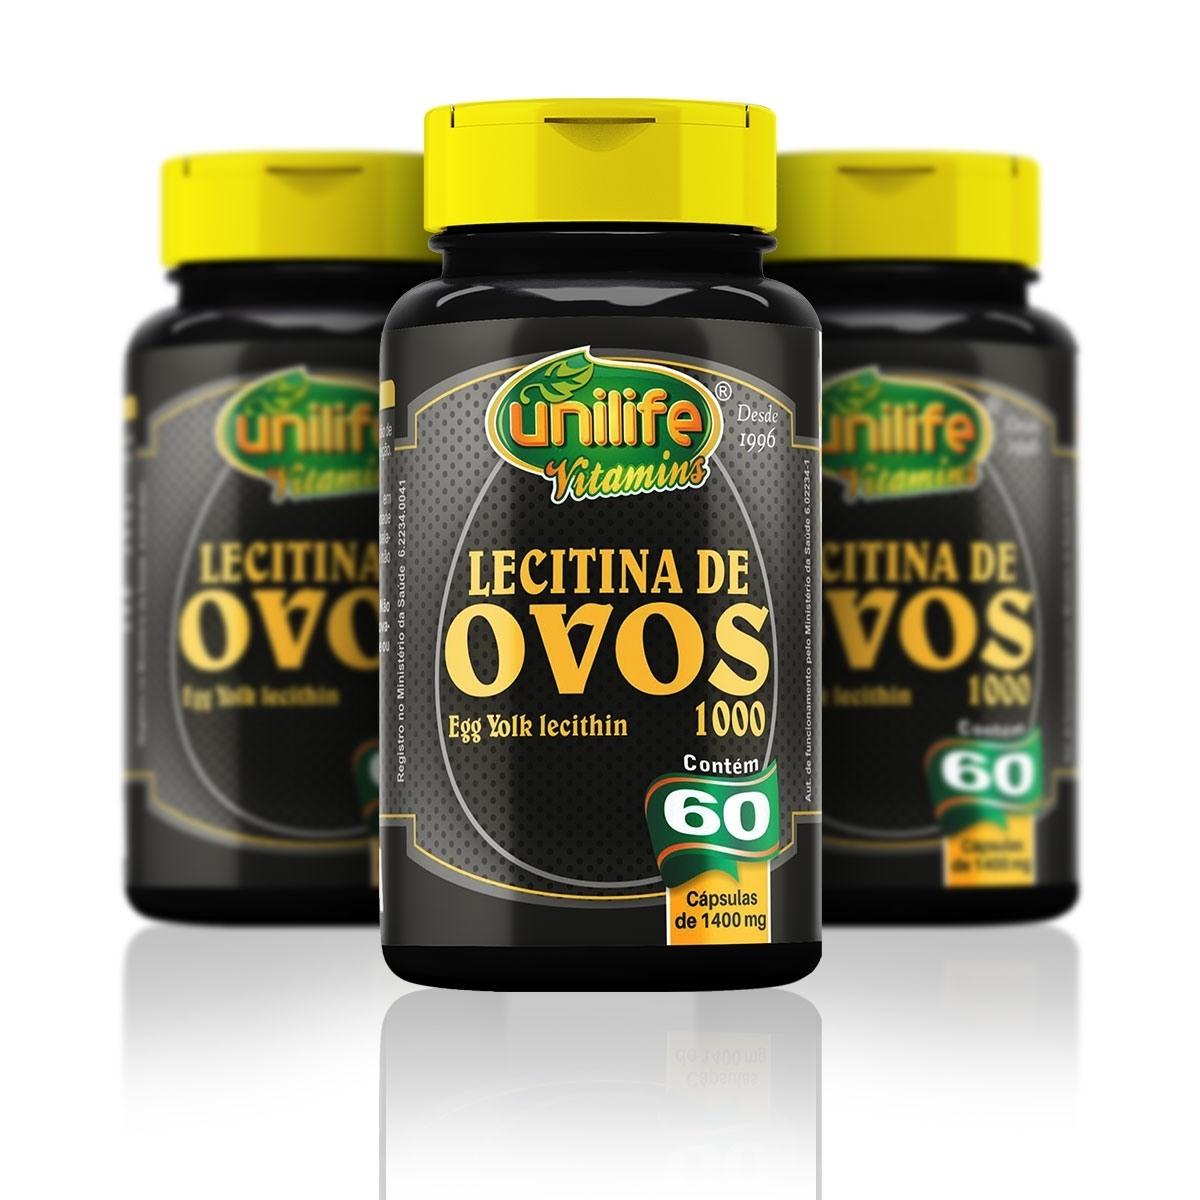 KIT 3 Lecitina de Ovos 60 cápsulas - Unilife